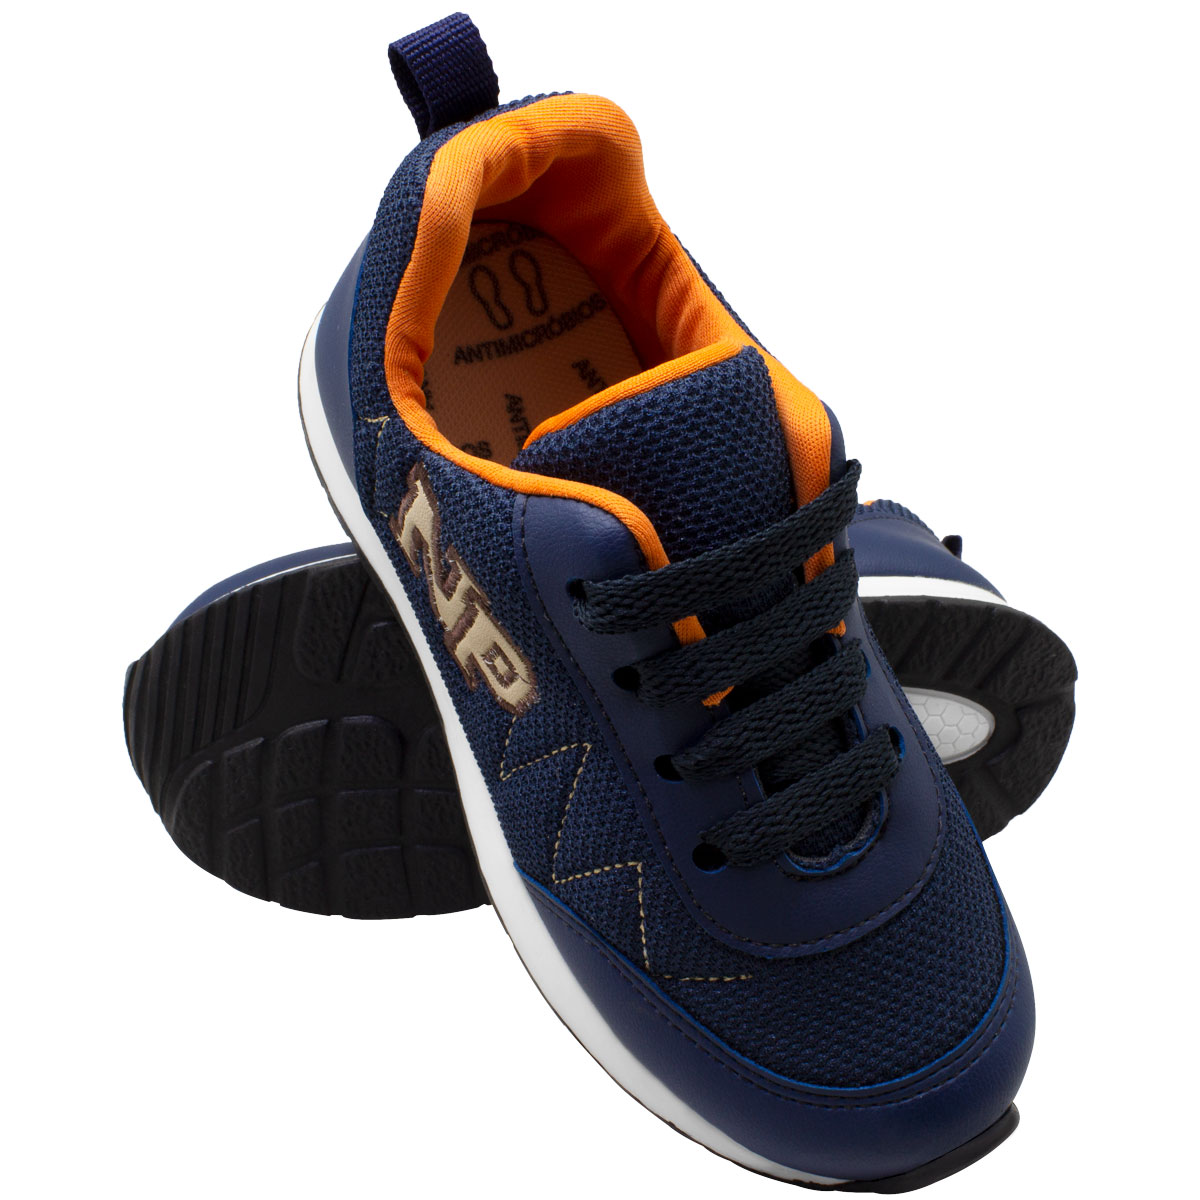 Tênis infantil masculino jogging c/biqueira 152-07-53X